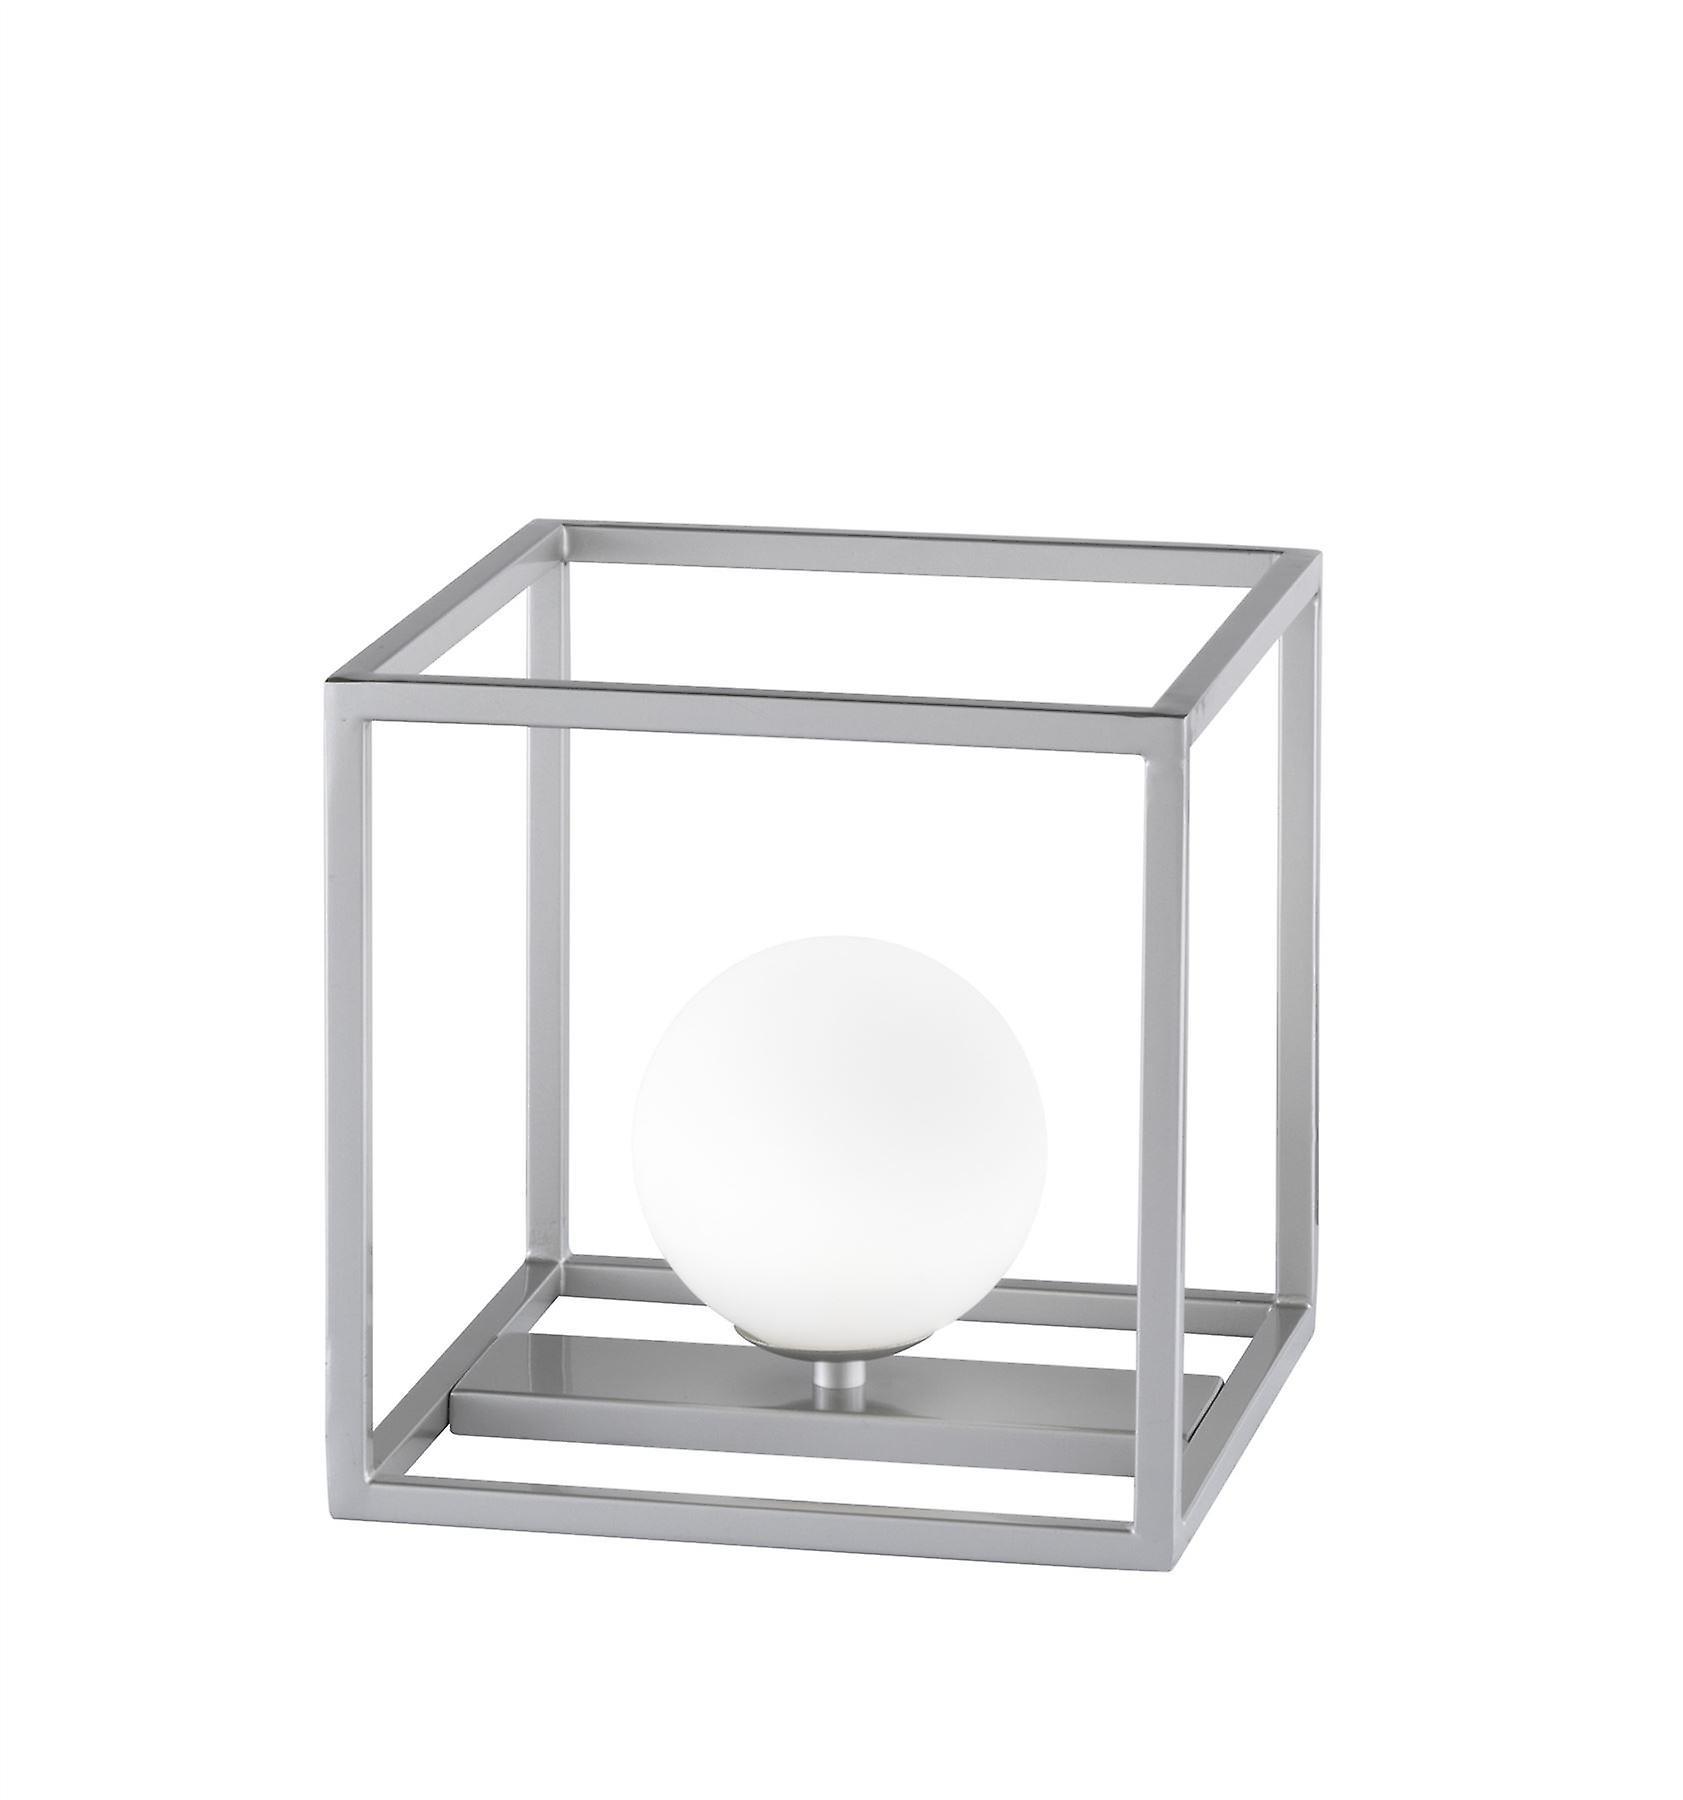 Wofi Aurelia - 1 lampe de table légère Matt Nickel - 8341.01.64.8000